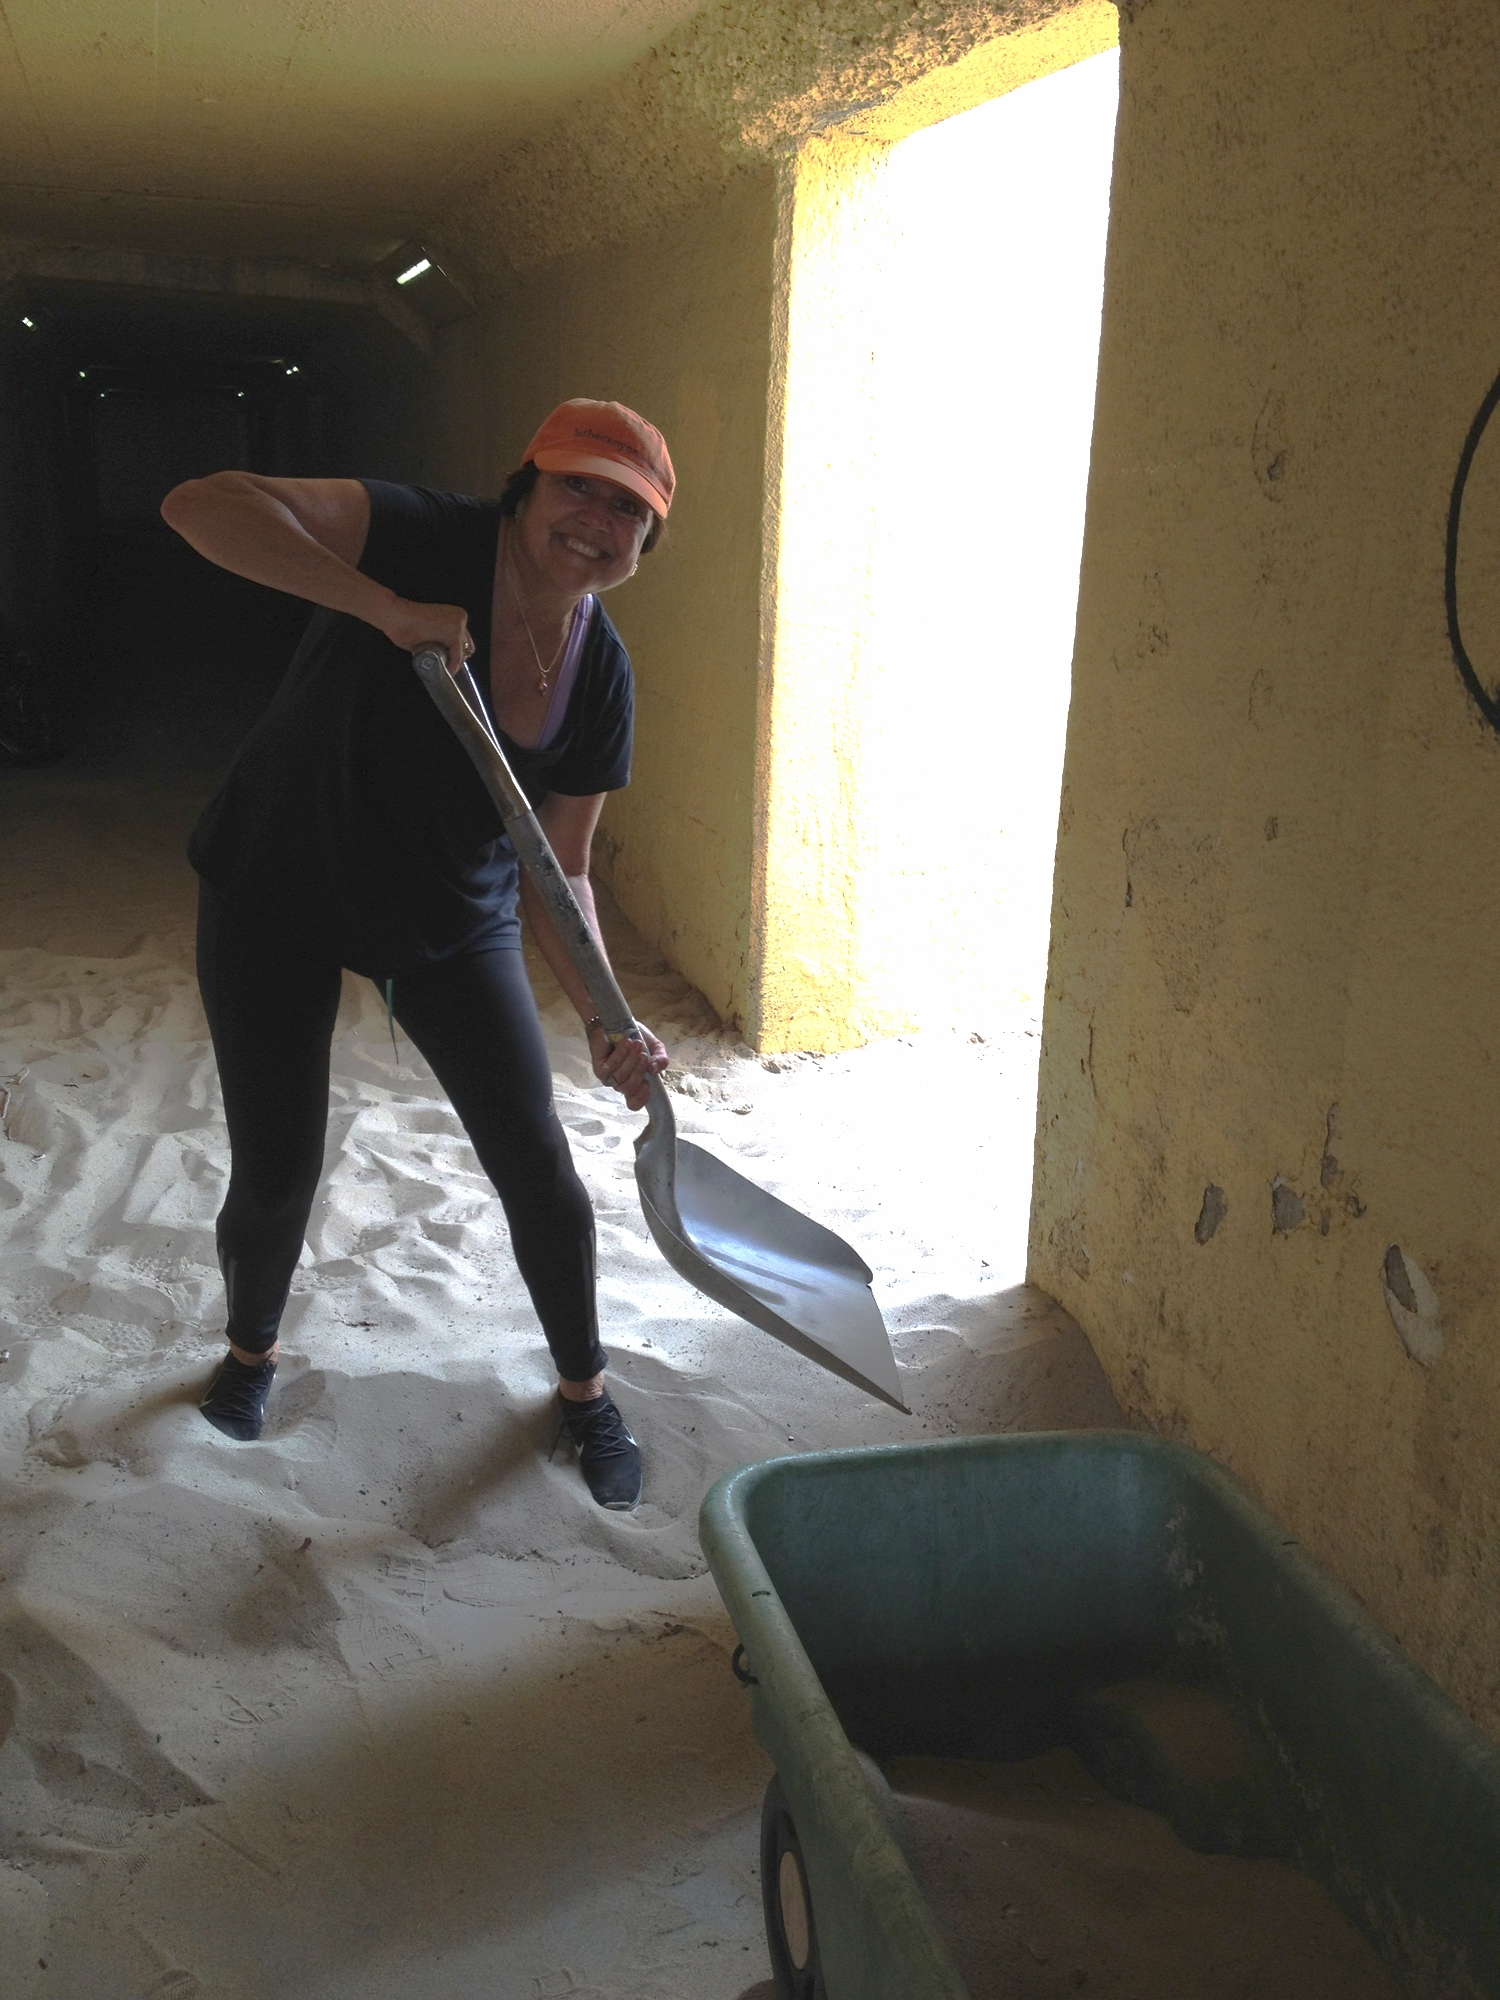 Sharon shoveling sand